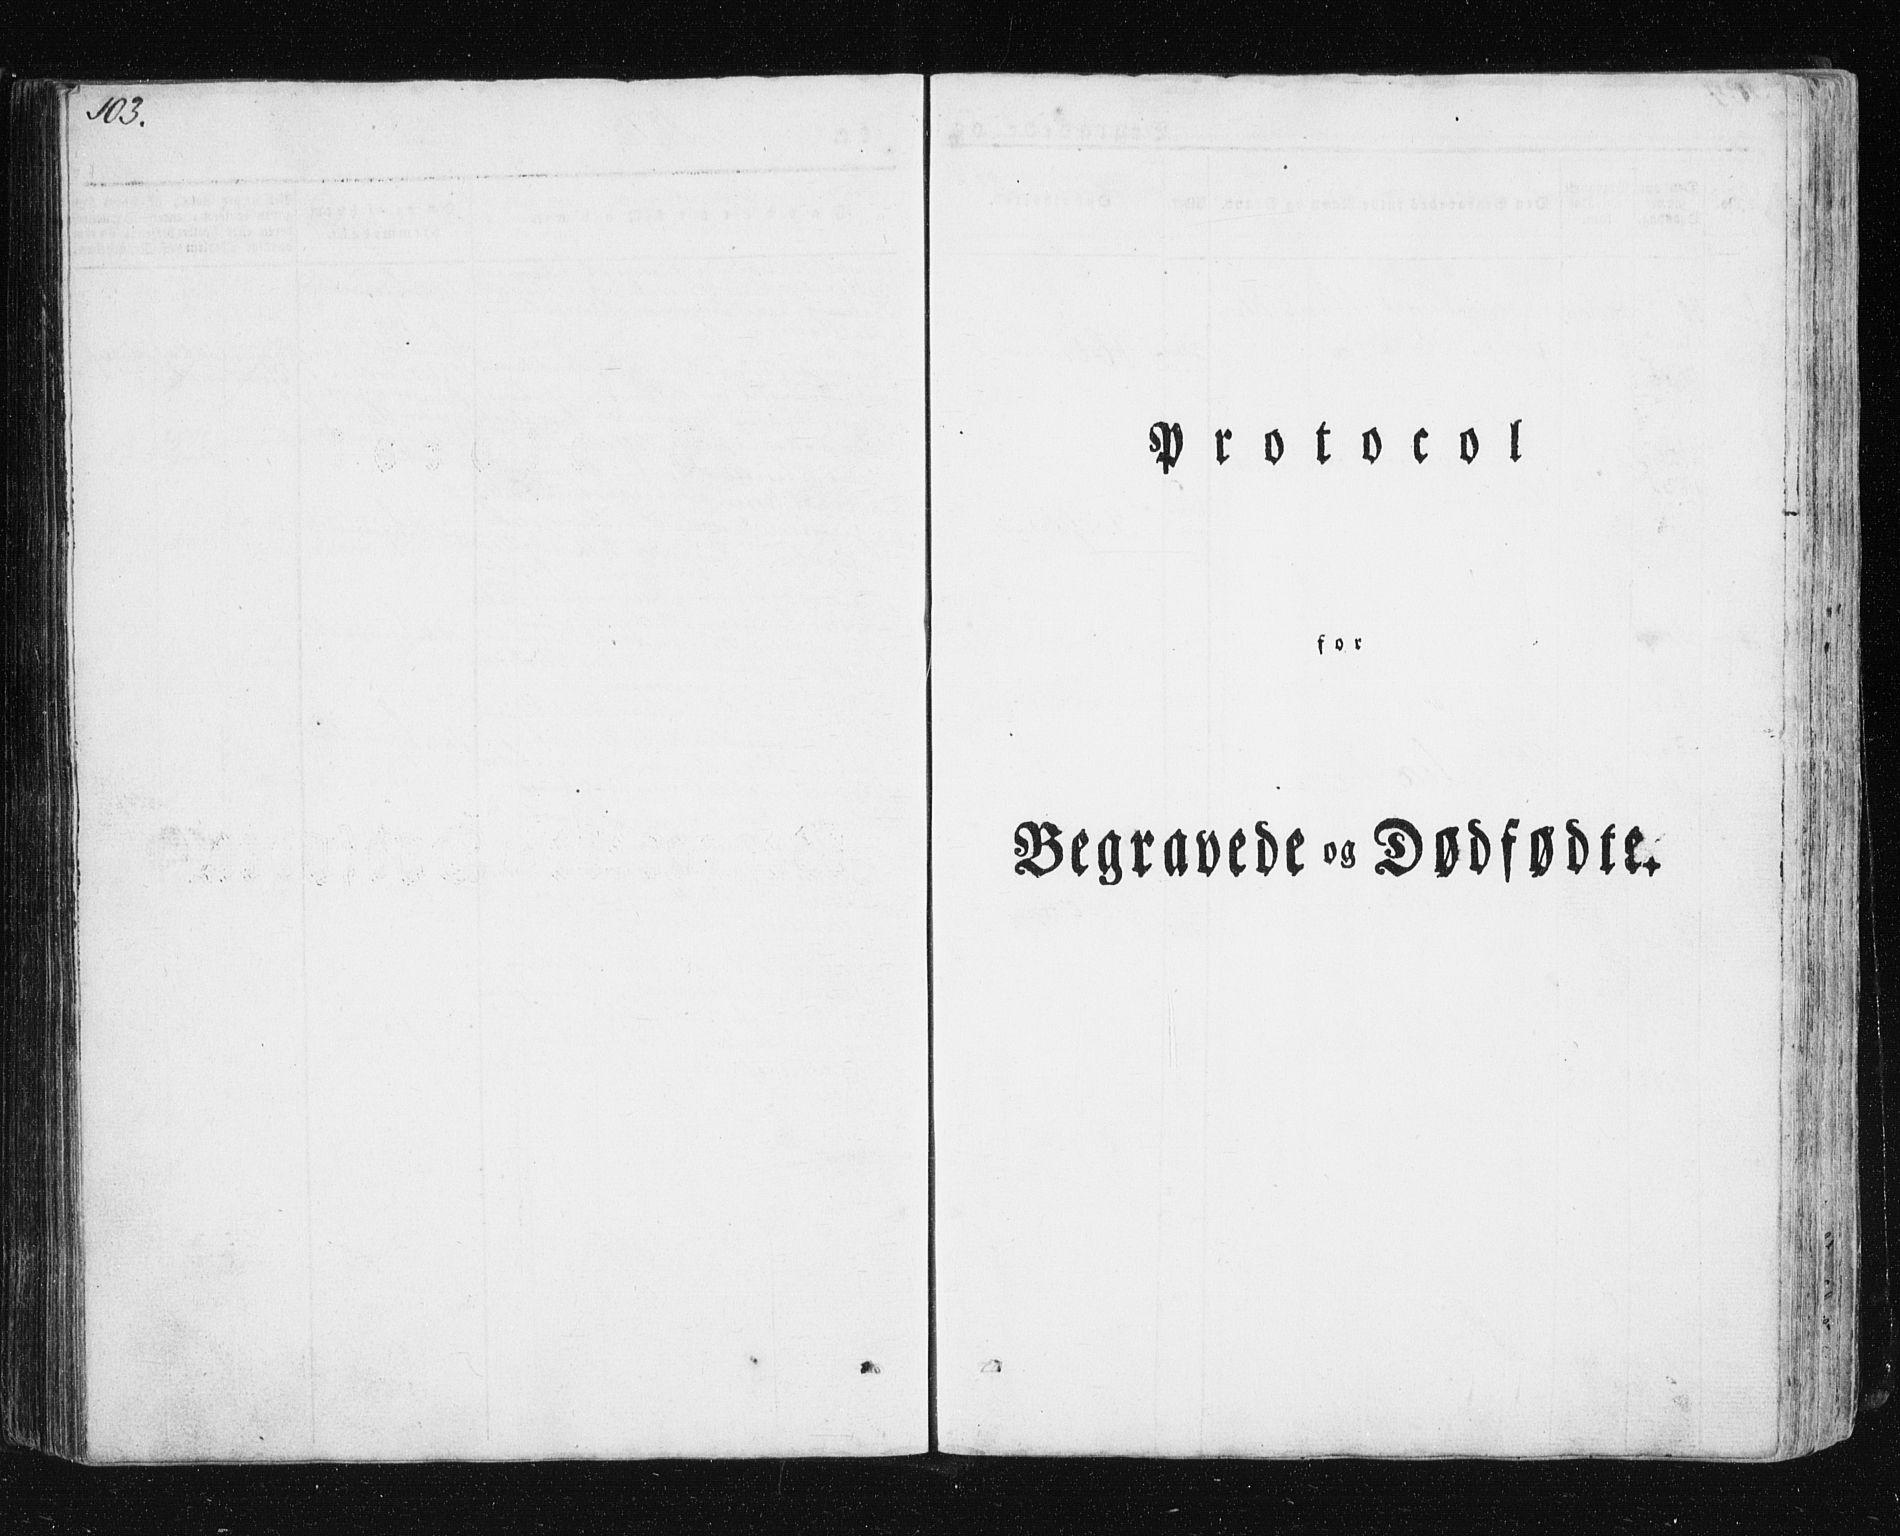 SATØ, Mefjord/Berg sokneprestkontor, G/Ga/Gab/L0011klokker: Klokkerbok nr. 11, 1833-1878, s. 103